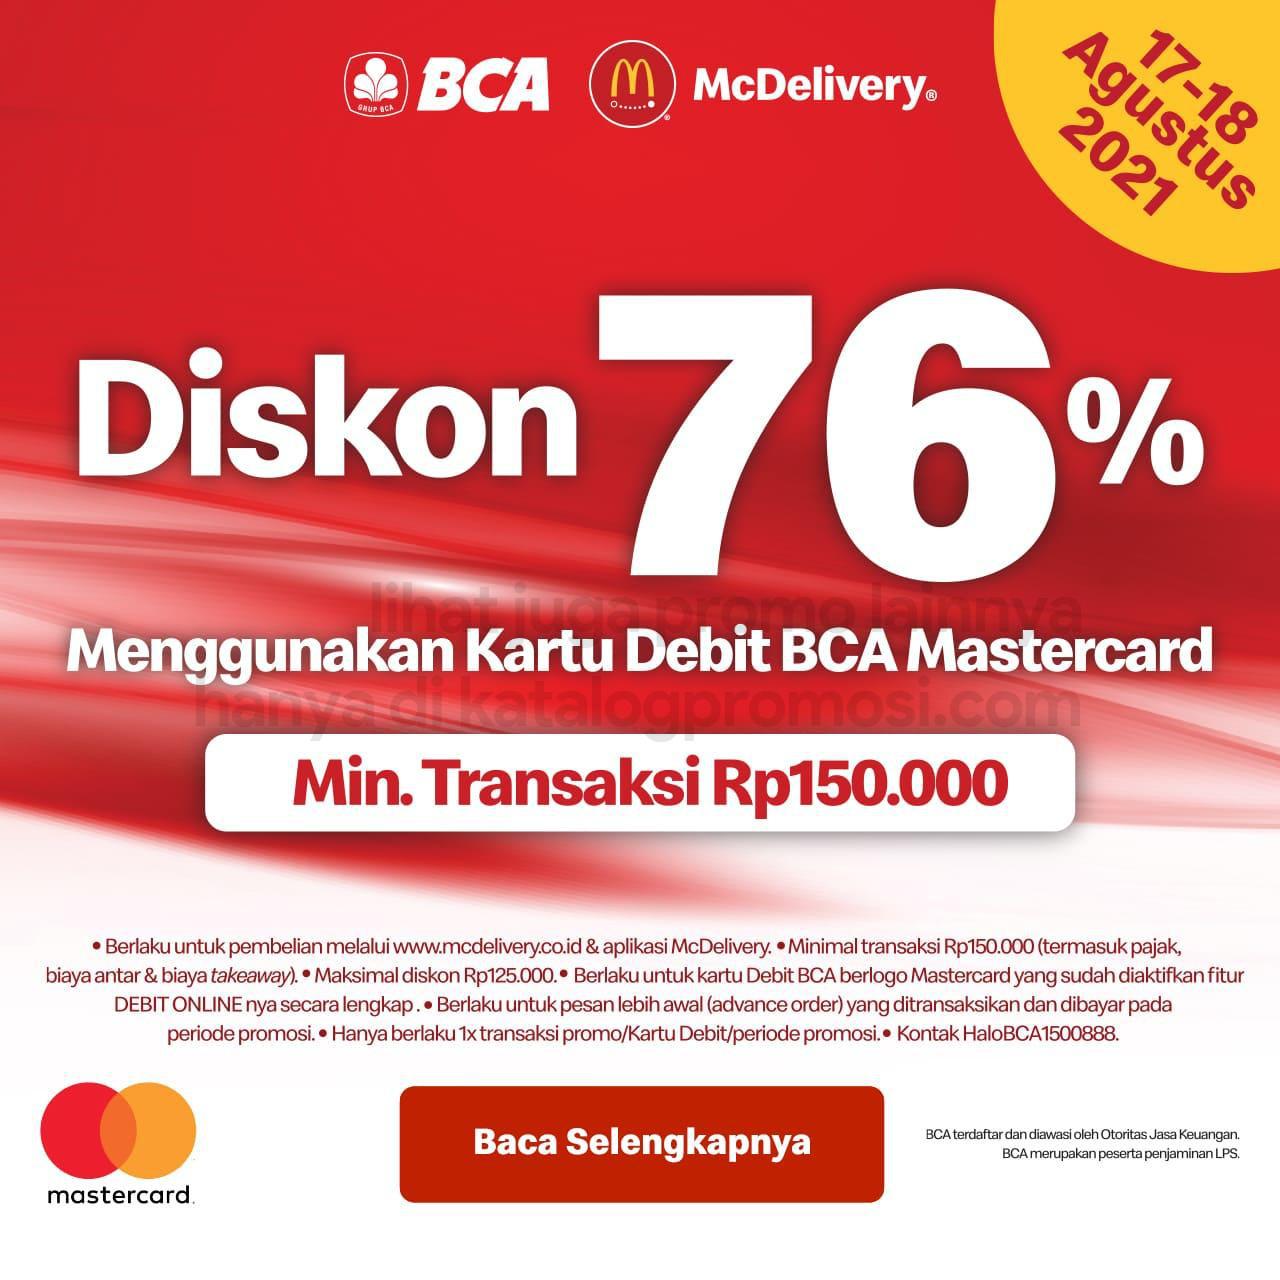 Promo McDonalds Spesial 17 Agustus - Diskon 76% dengan Kartu Debit BCA berlogo Mastercard